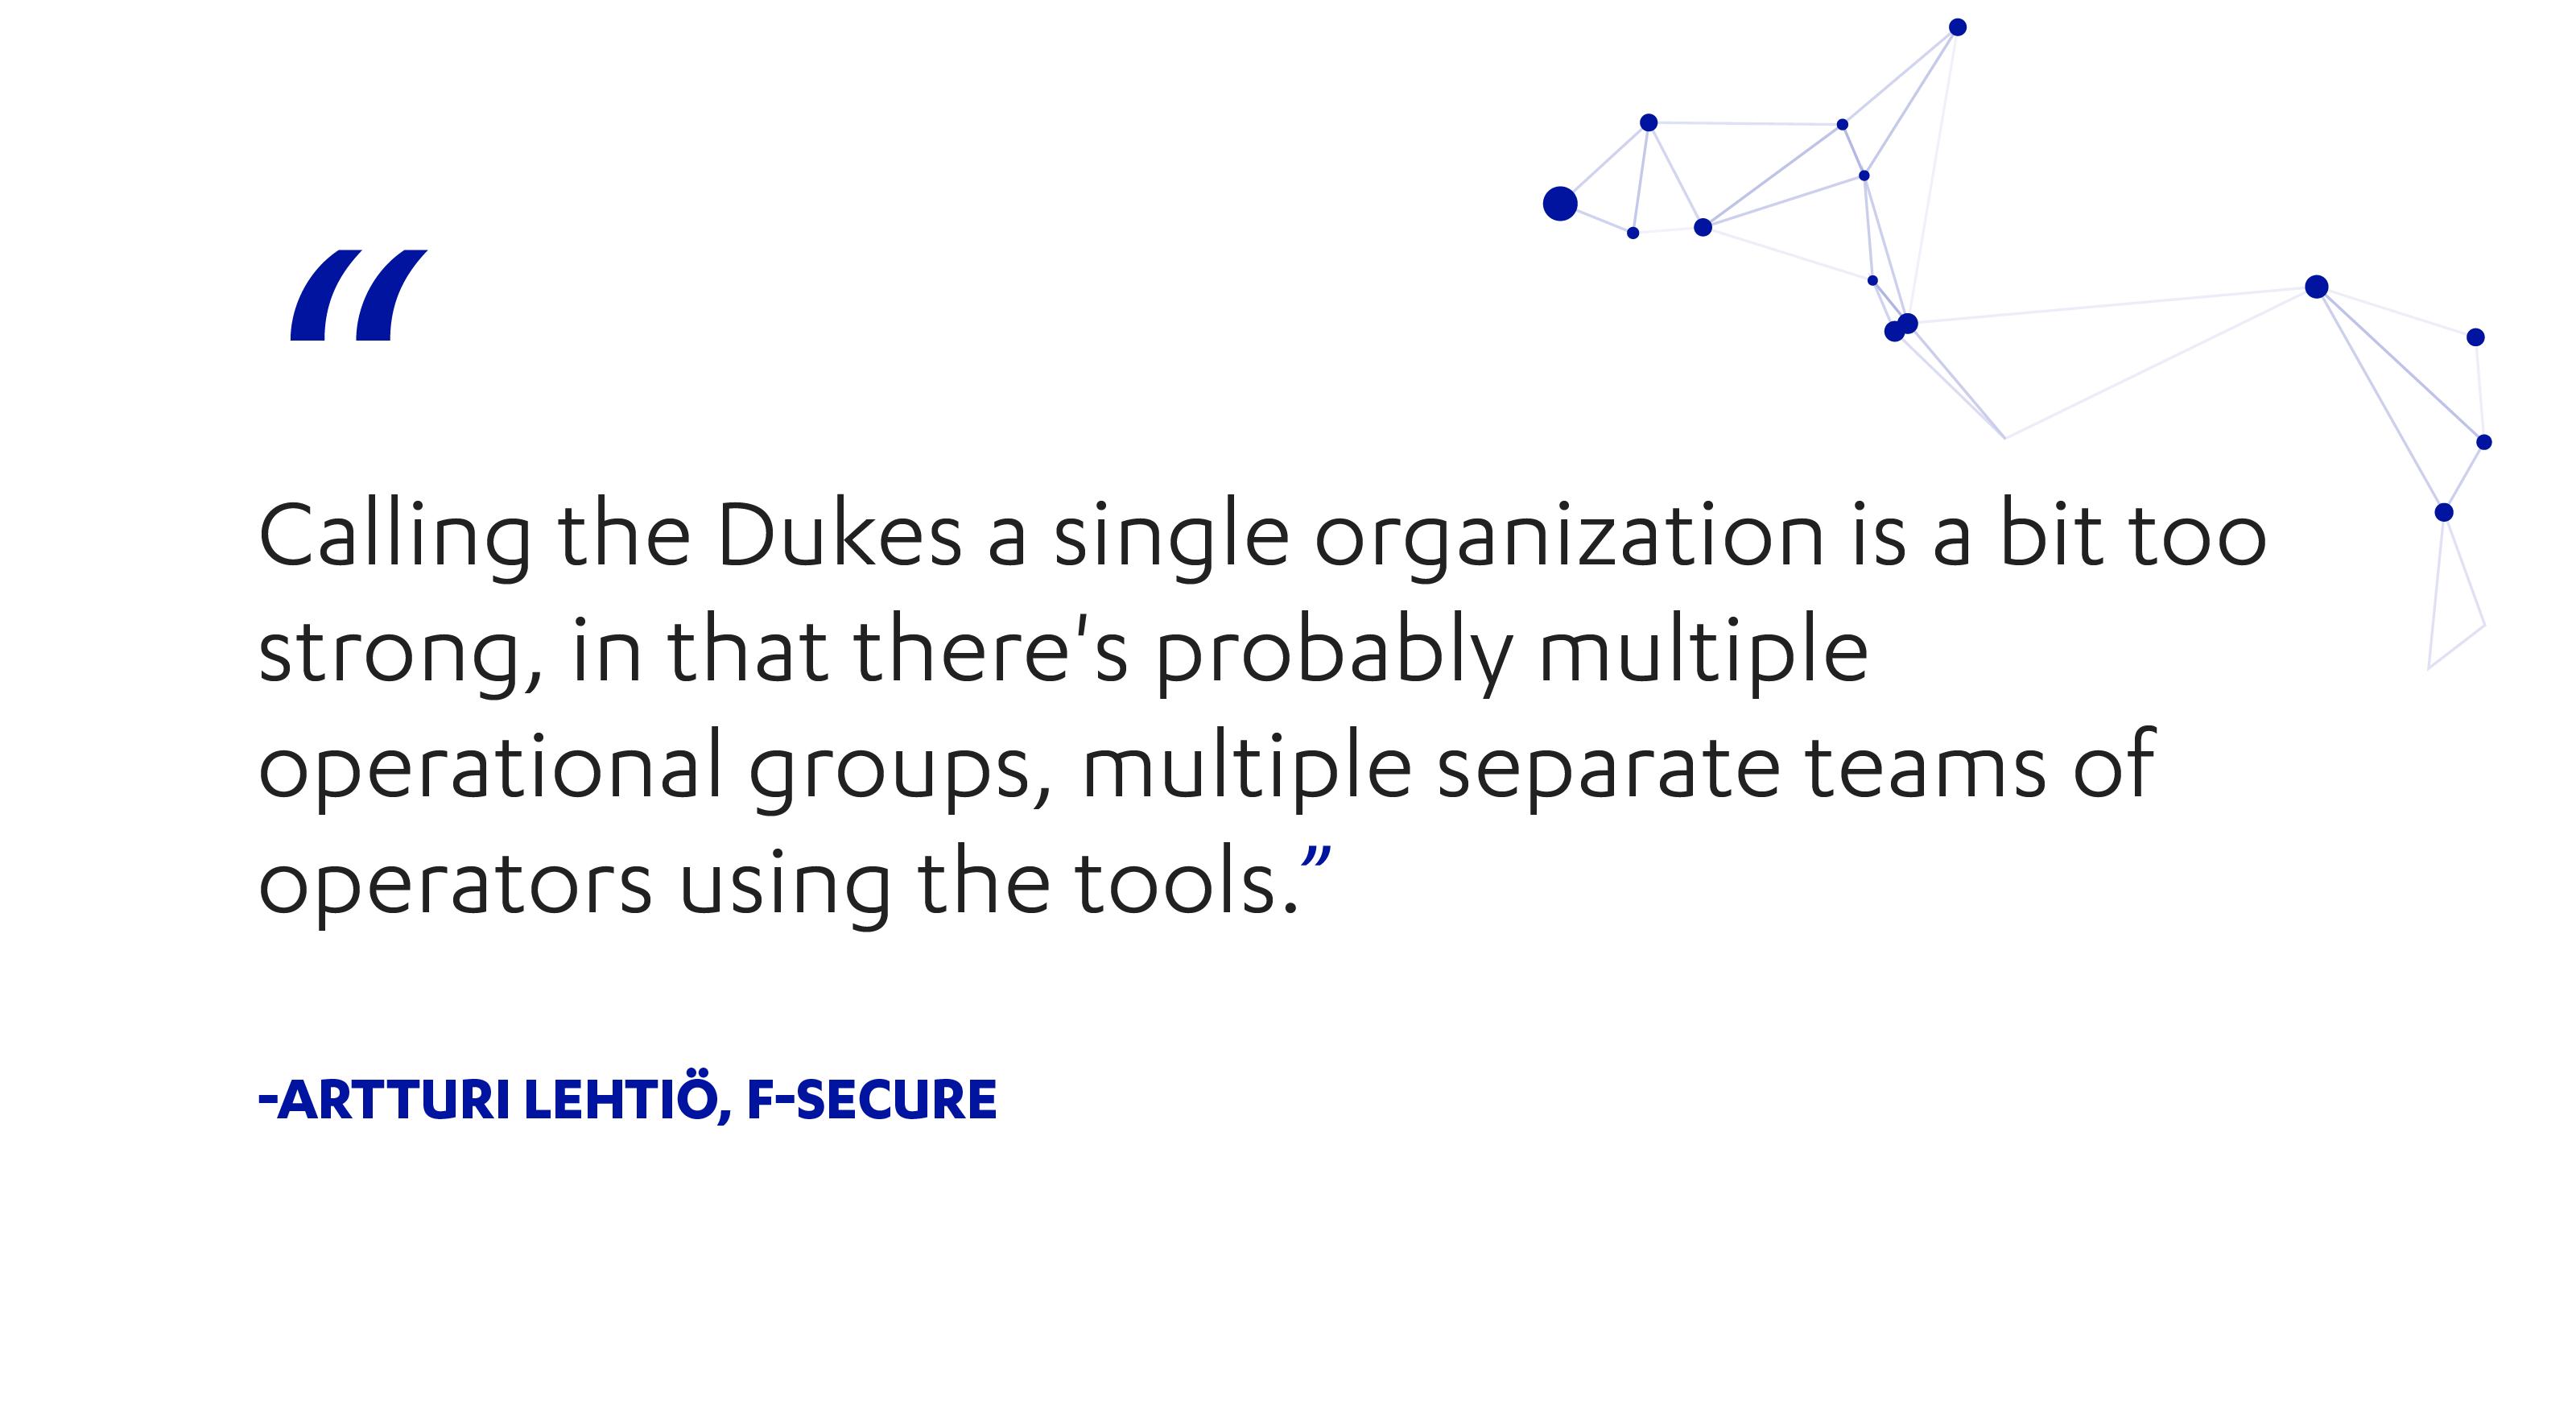 F-Secure's Artturi Lehtio on whether the Dukes are a single organization